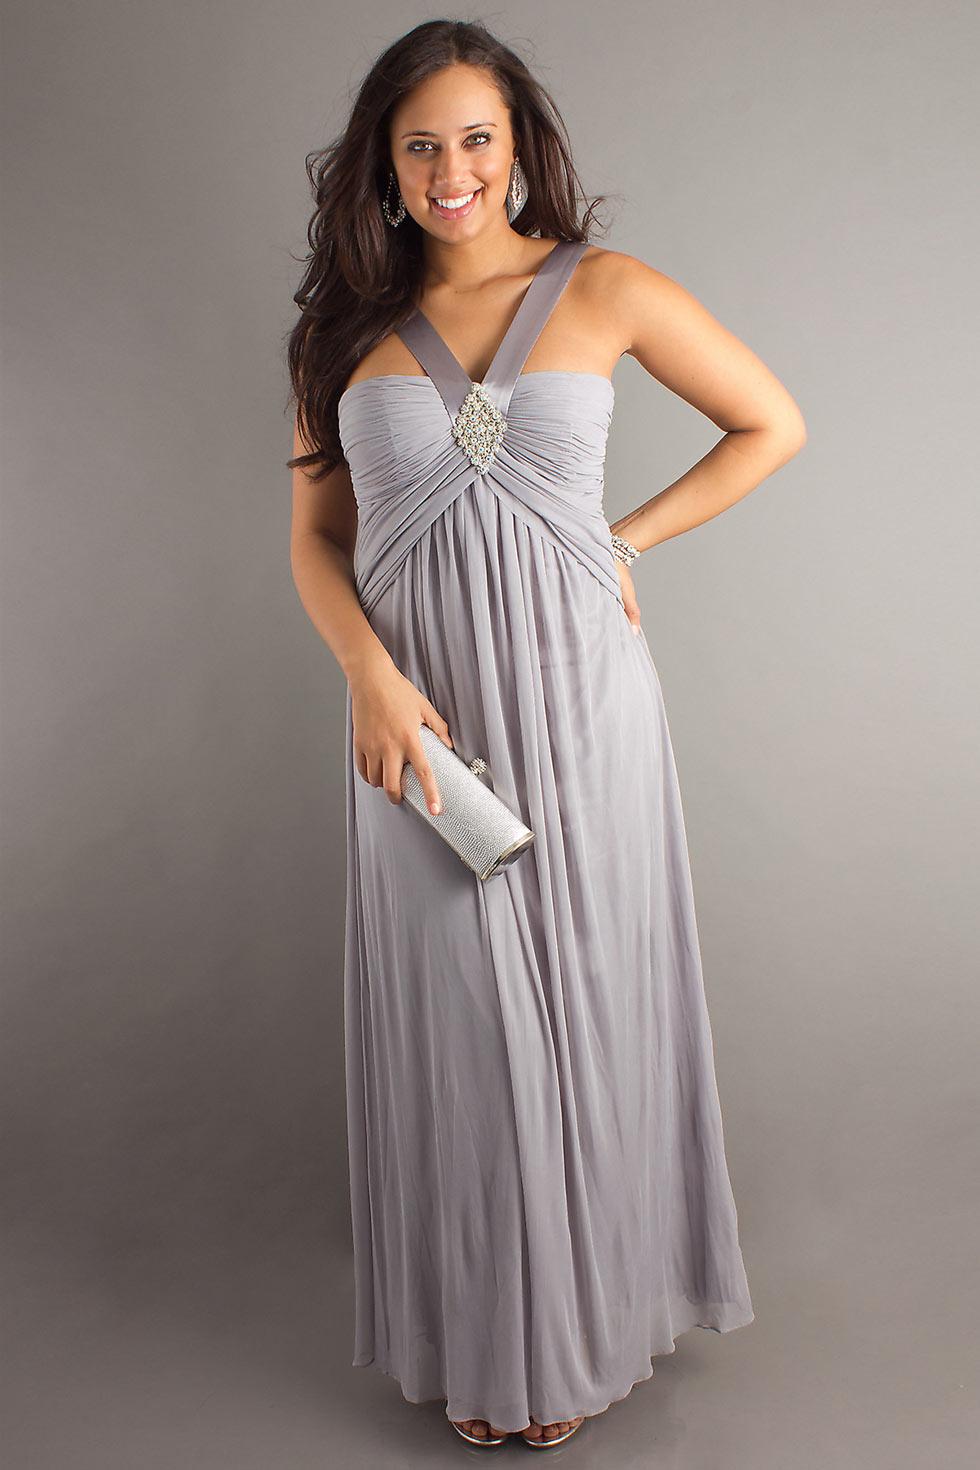 robe de soirée grande taille grise empire col v avec bretelles